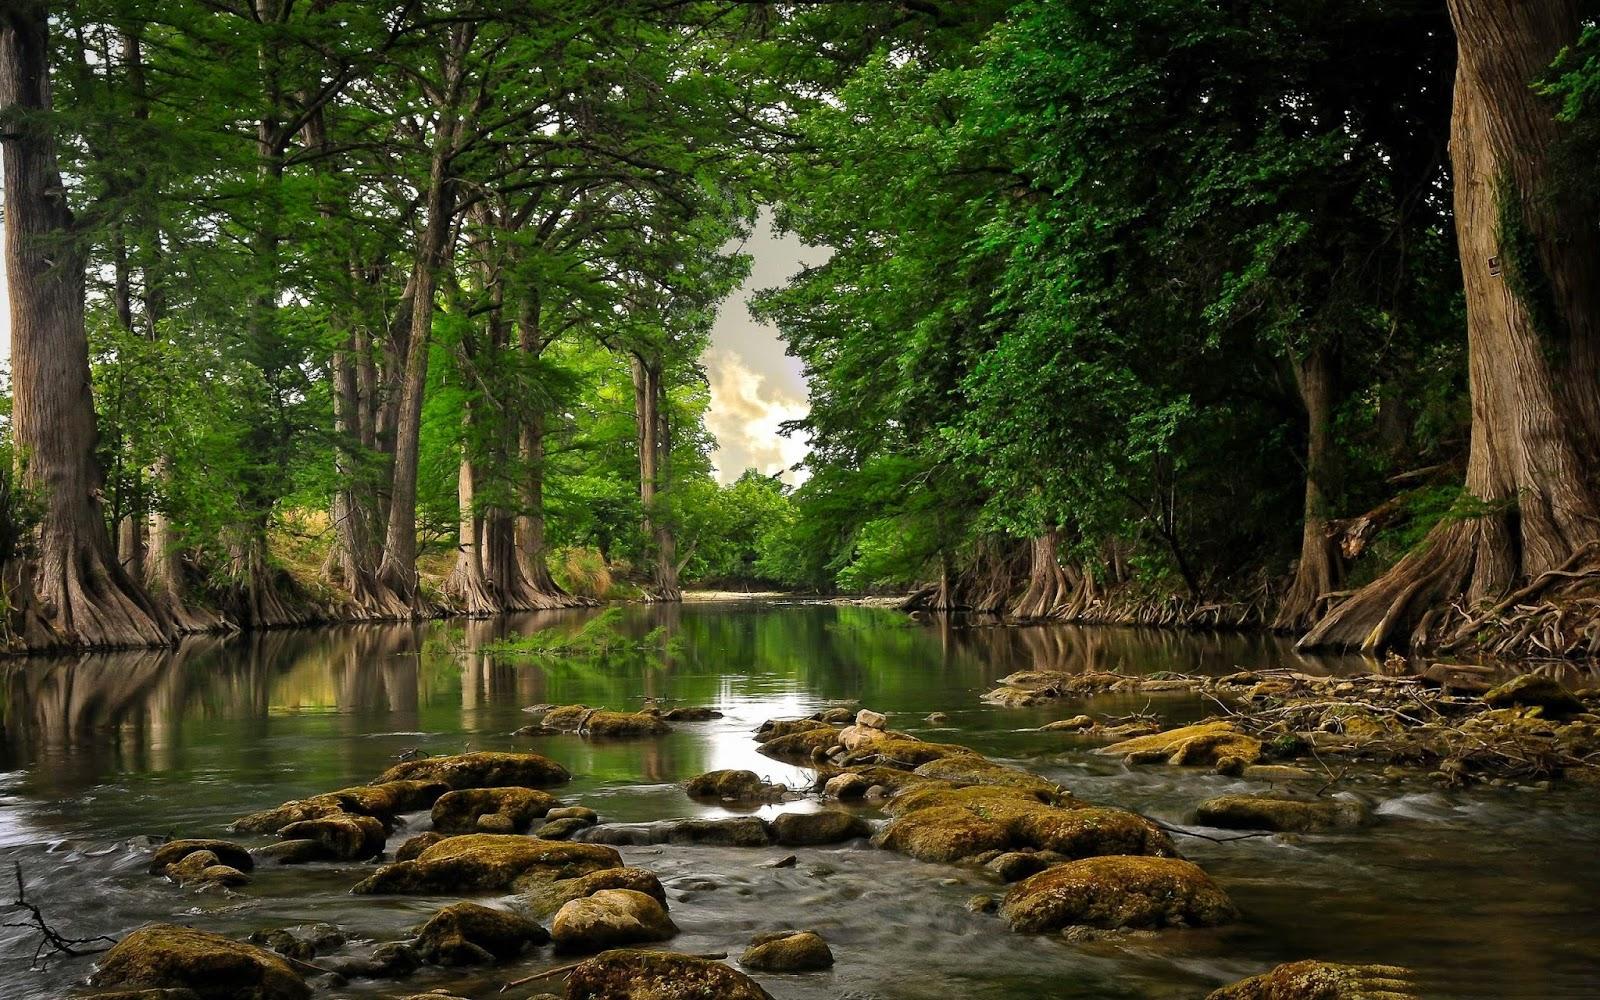 River Landscape Photography - HD Wallpaper